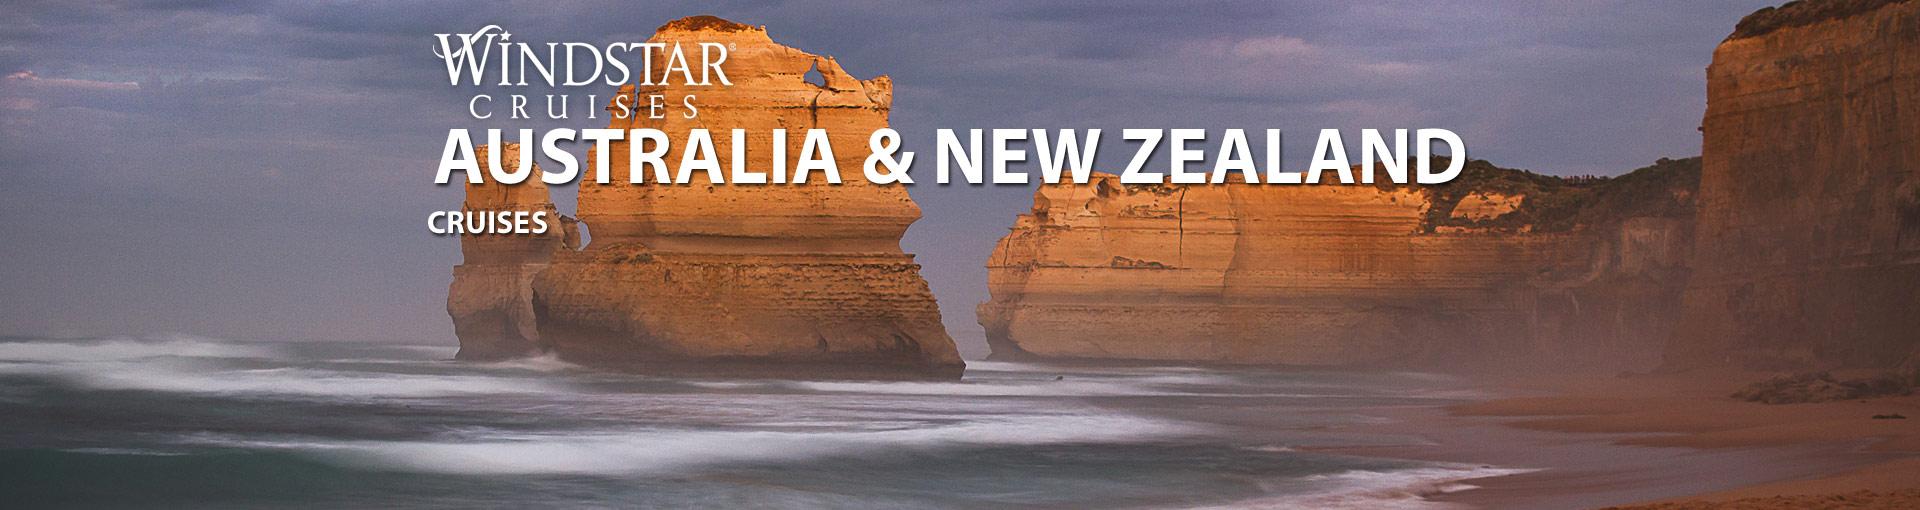 WND - Aus/NZ Vendor Destination Banner